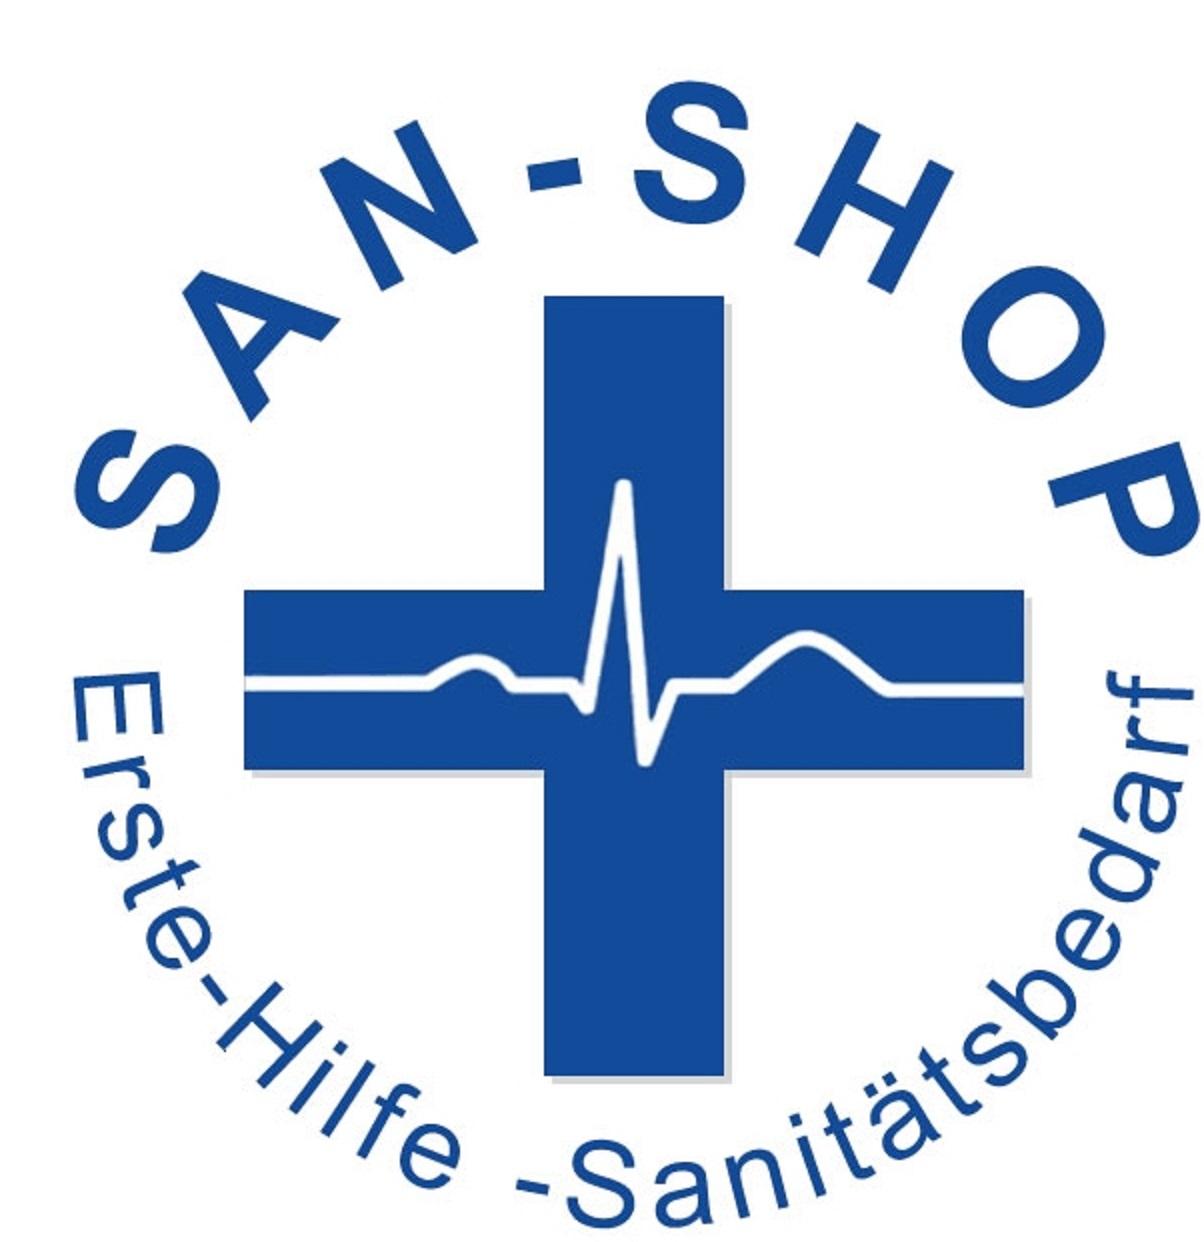 SAN-SHOP Erste-Hilfe Sanitätsbedarf-Logo